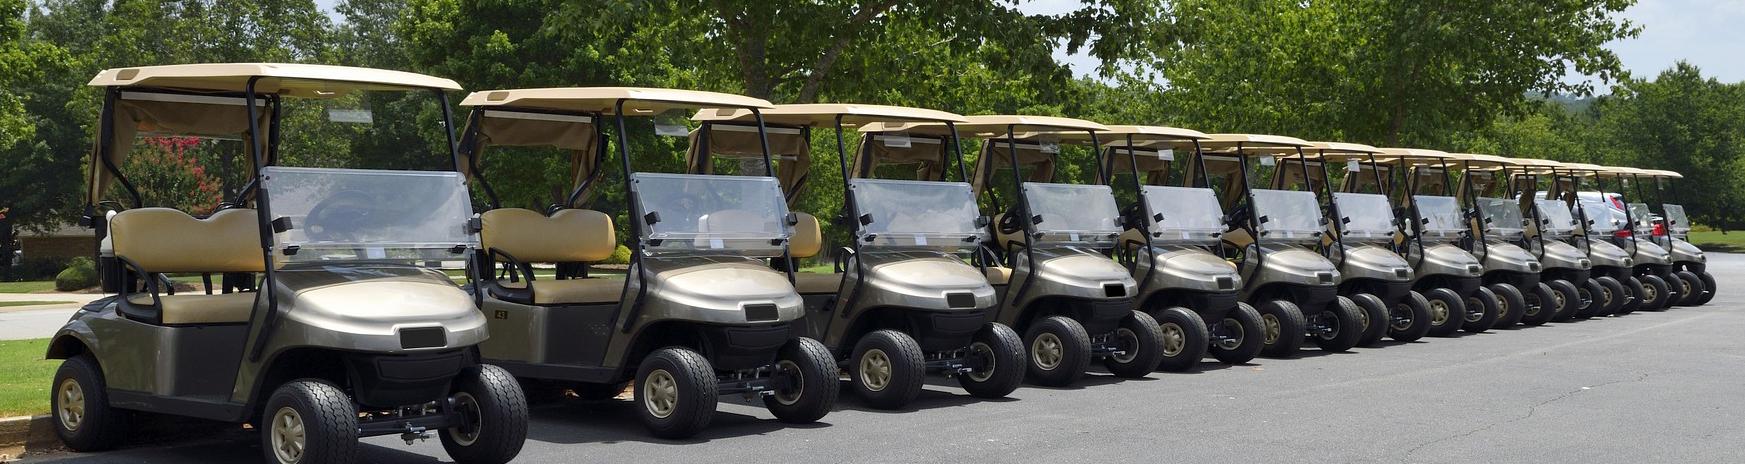 Golf Carts.jpg